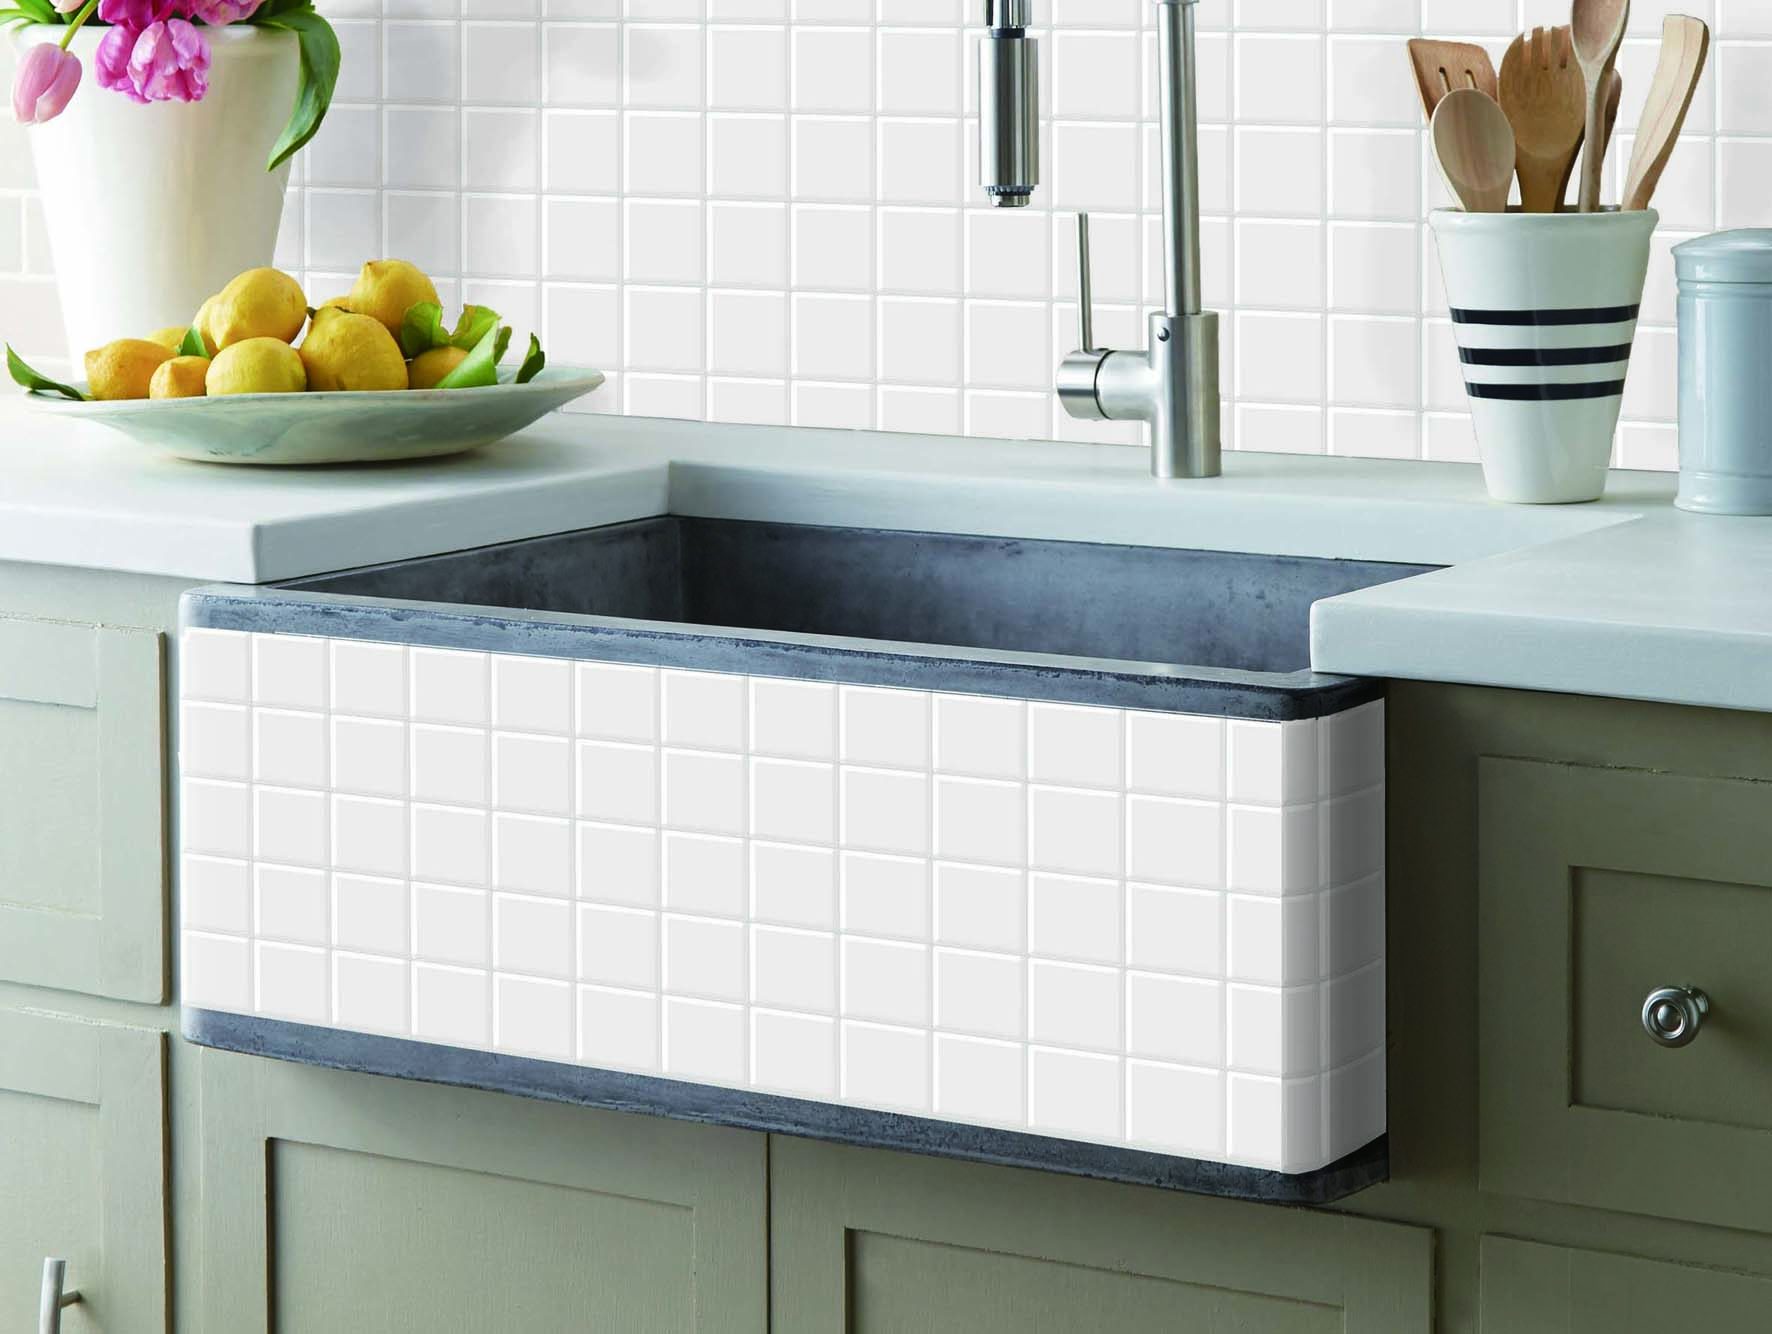 Peel and Stick Kitchen Backsplash Tiles, White Decorative Tile, (10 ...